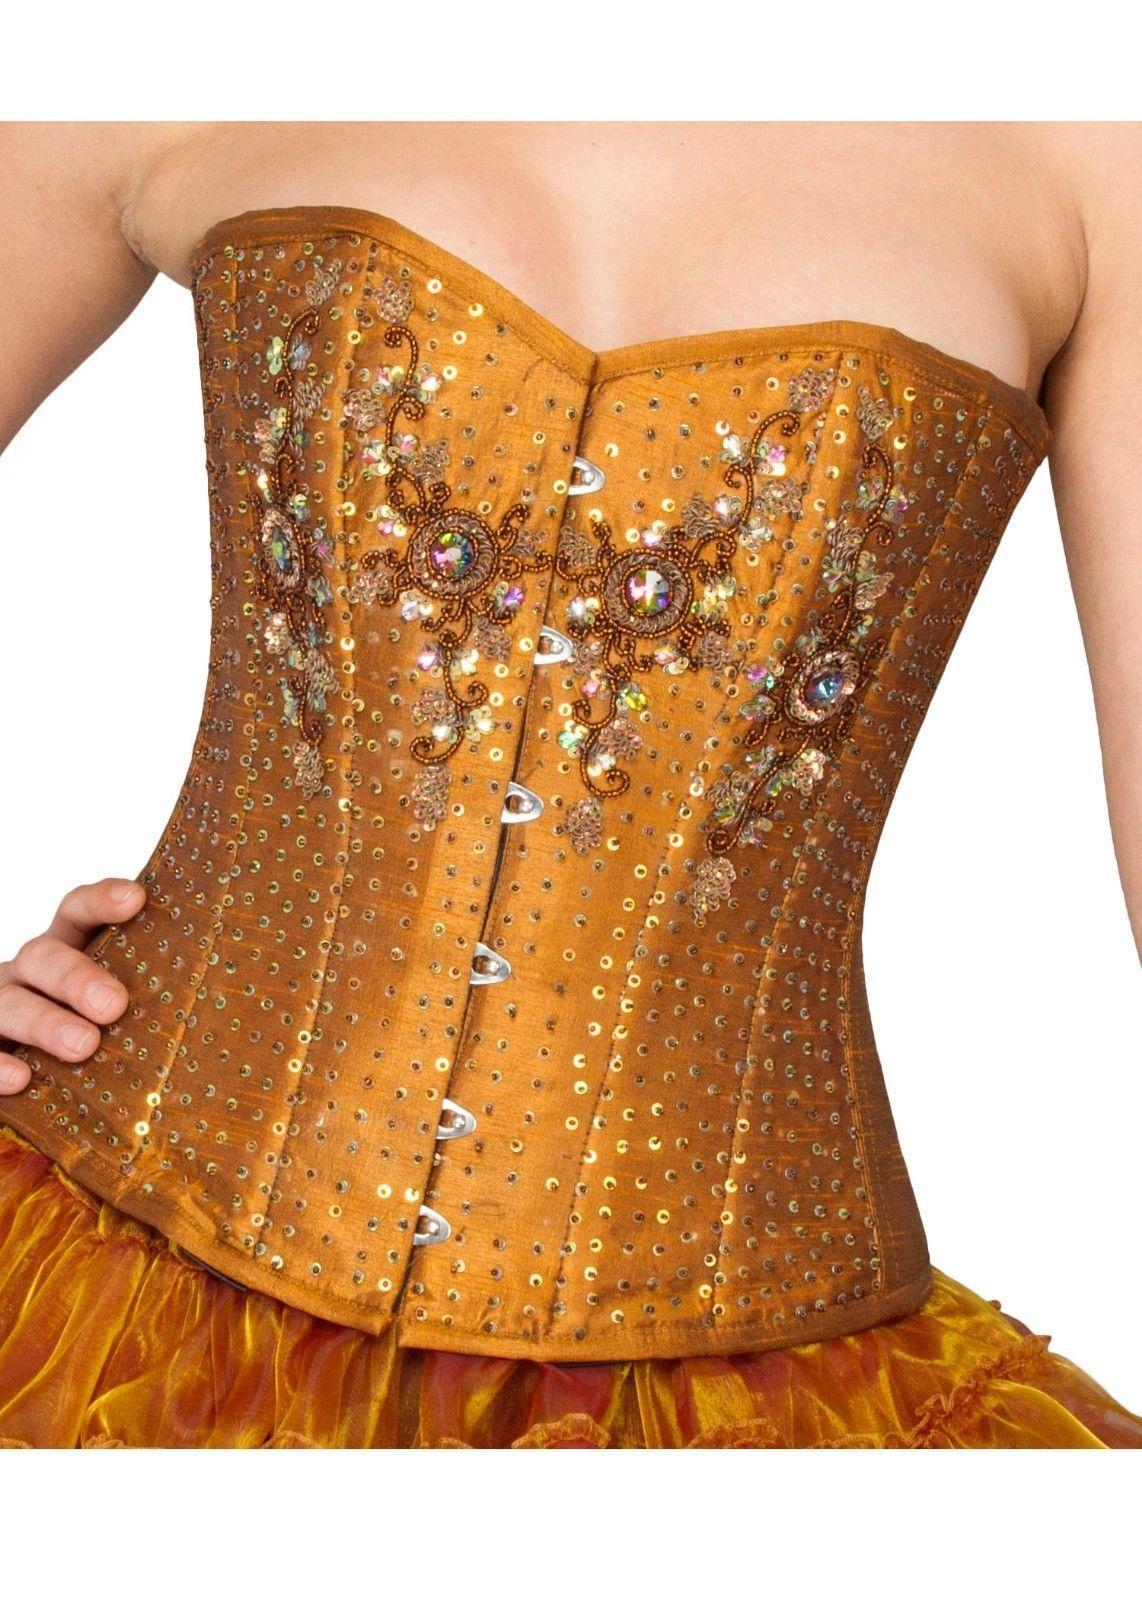 Golden Cotton Silk Handmade Sequins Gothic Burlesque Bustier Overbust Corset Top